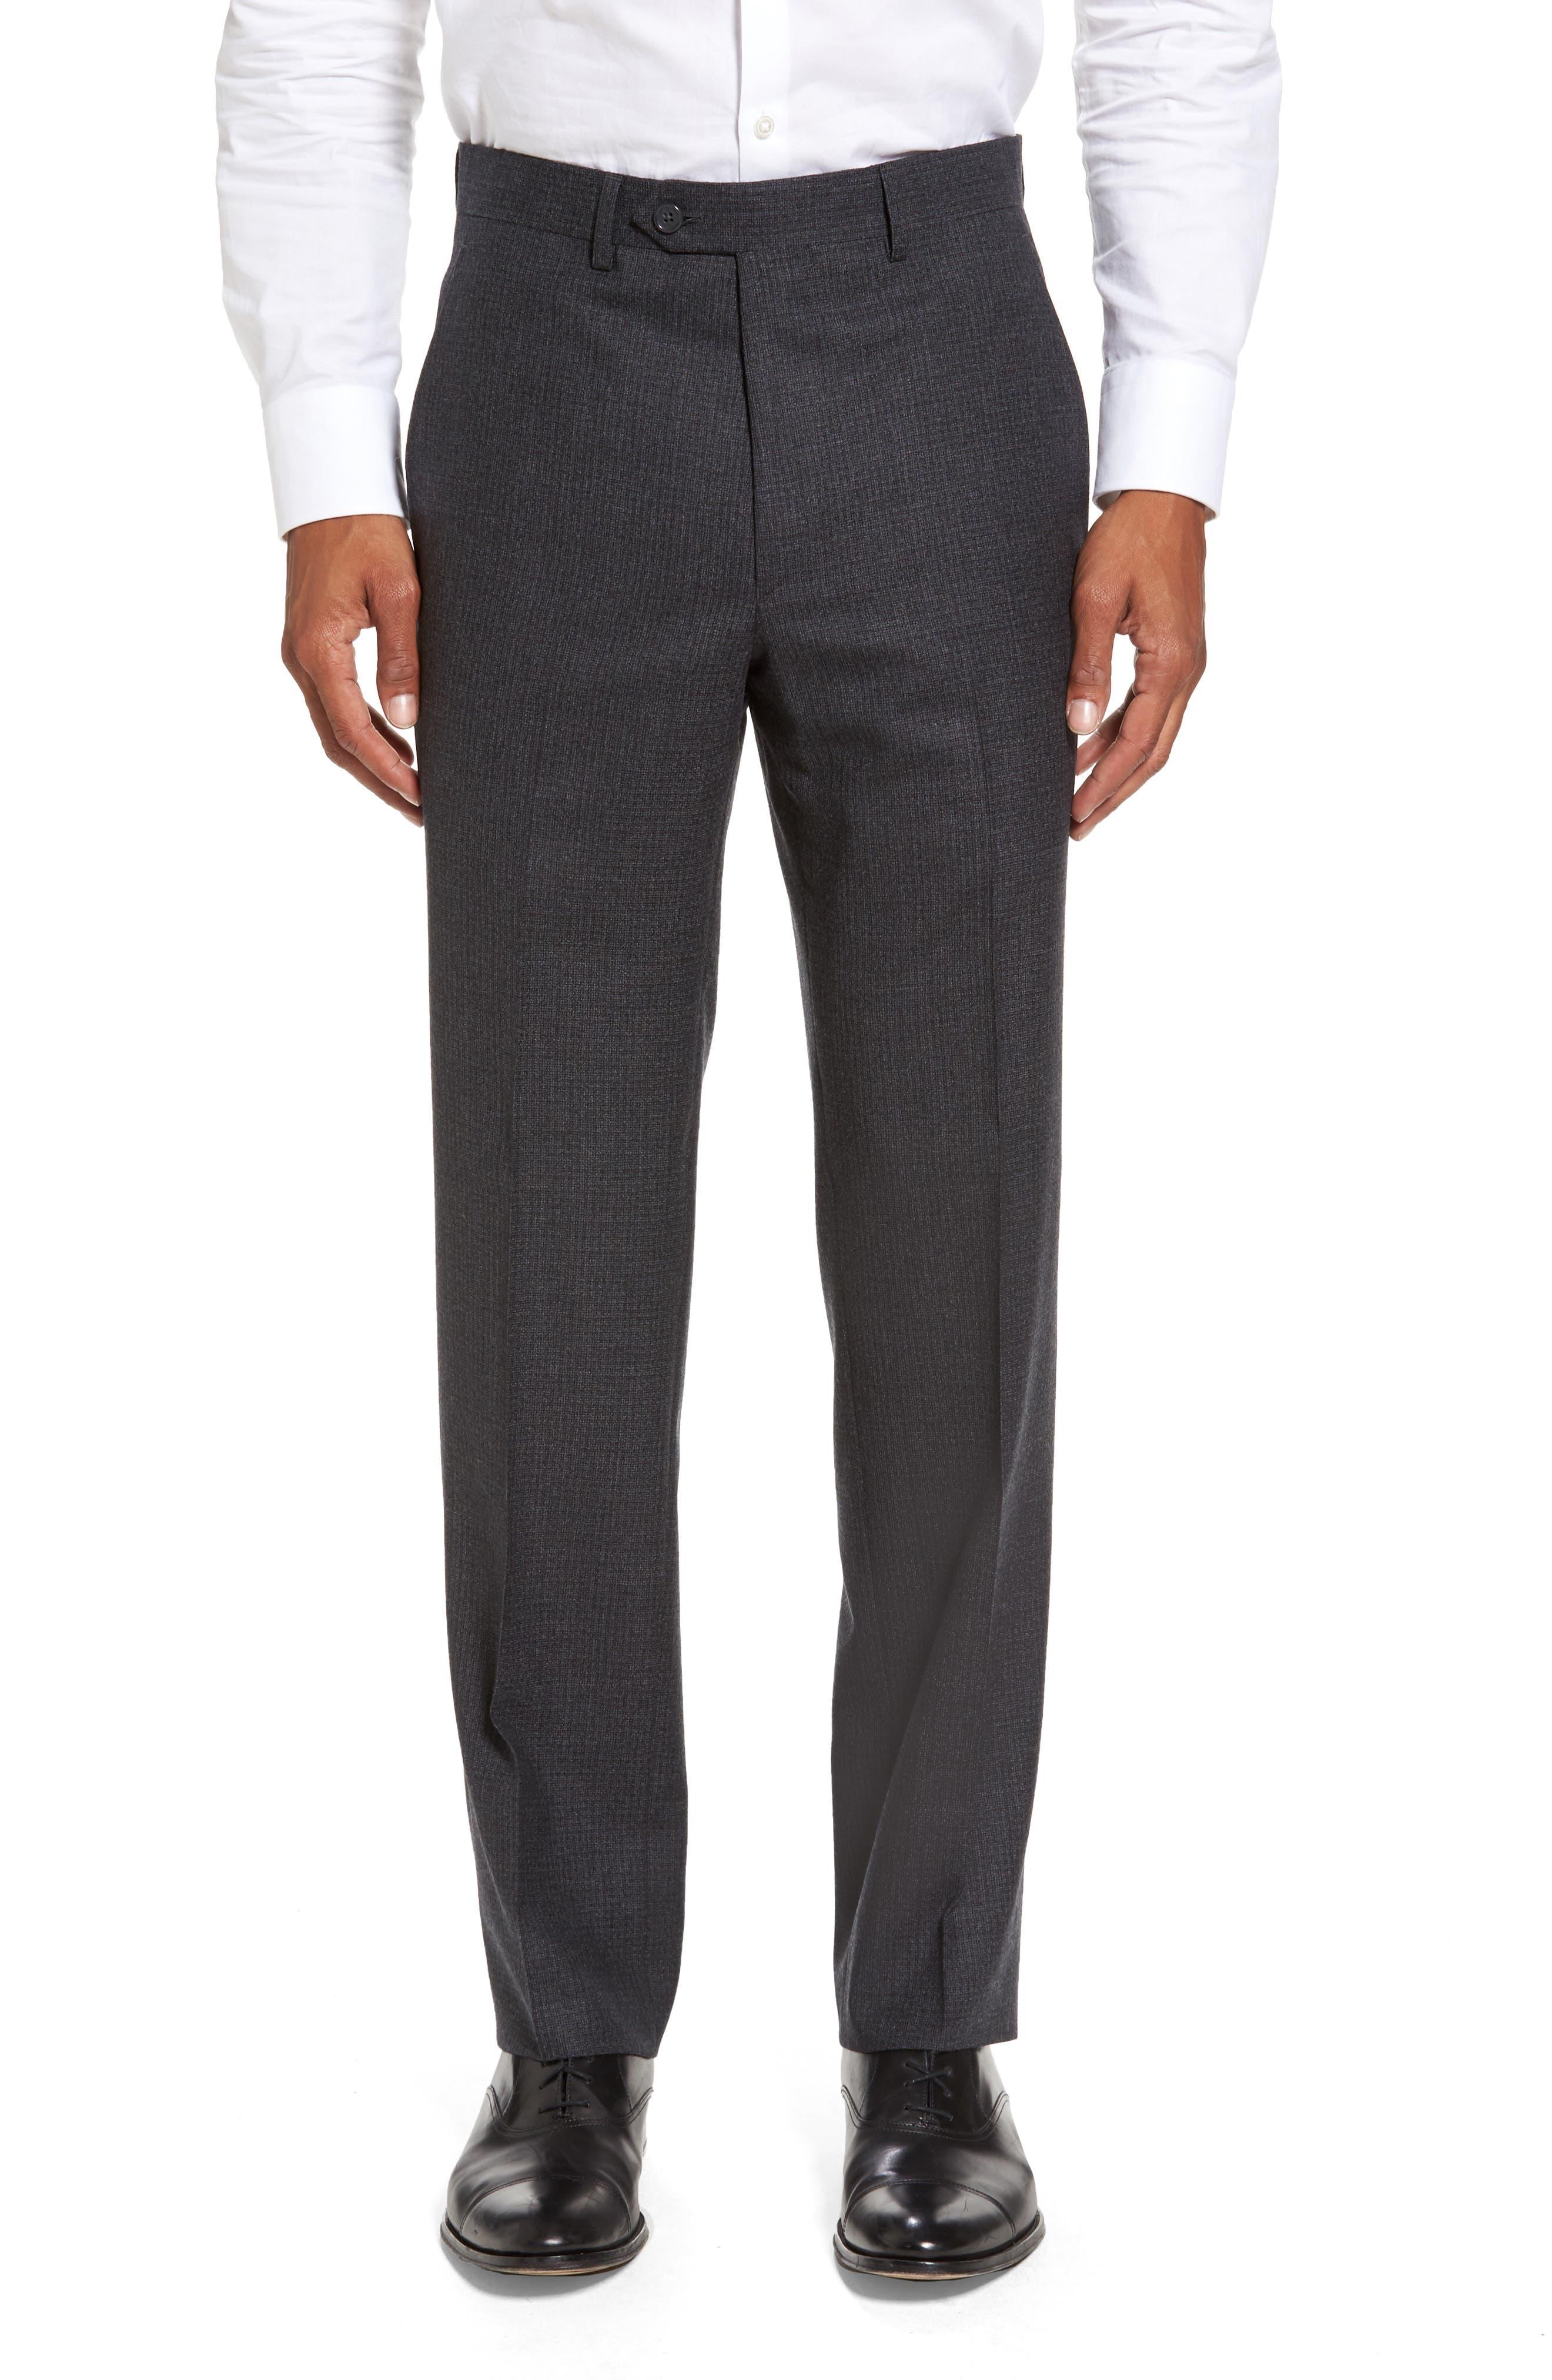 Romero Regular Fit Flat Front Trousers,                         Main,                         color, 010